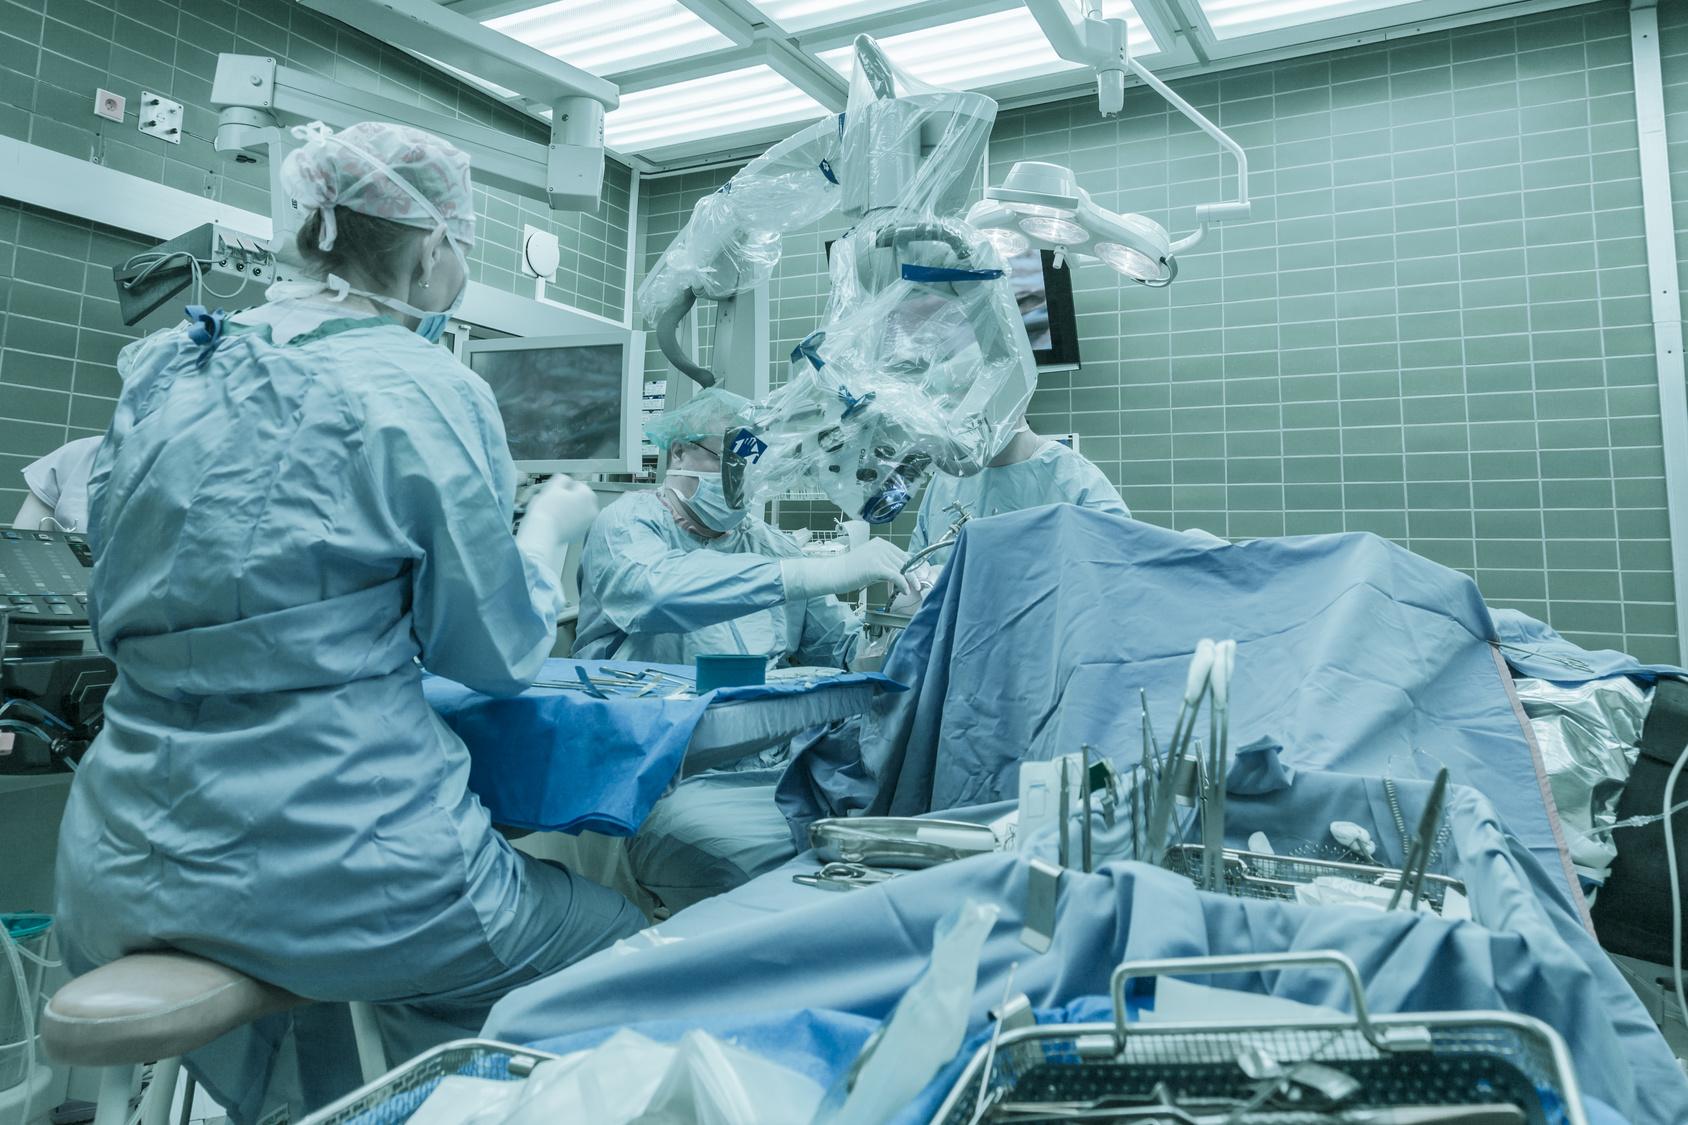 u1253 cerebral venous sinus thrombosis surgical thrombectomy